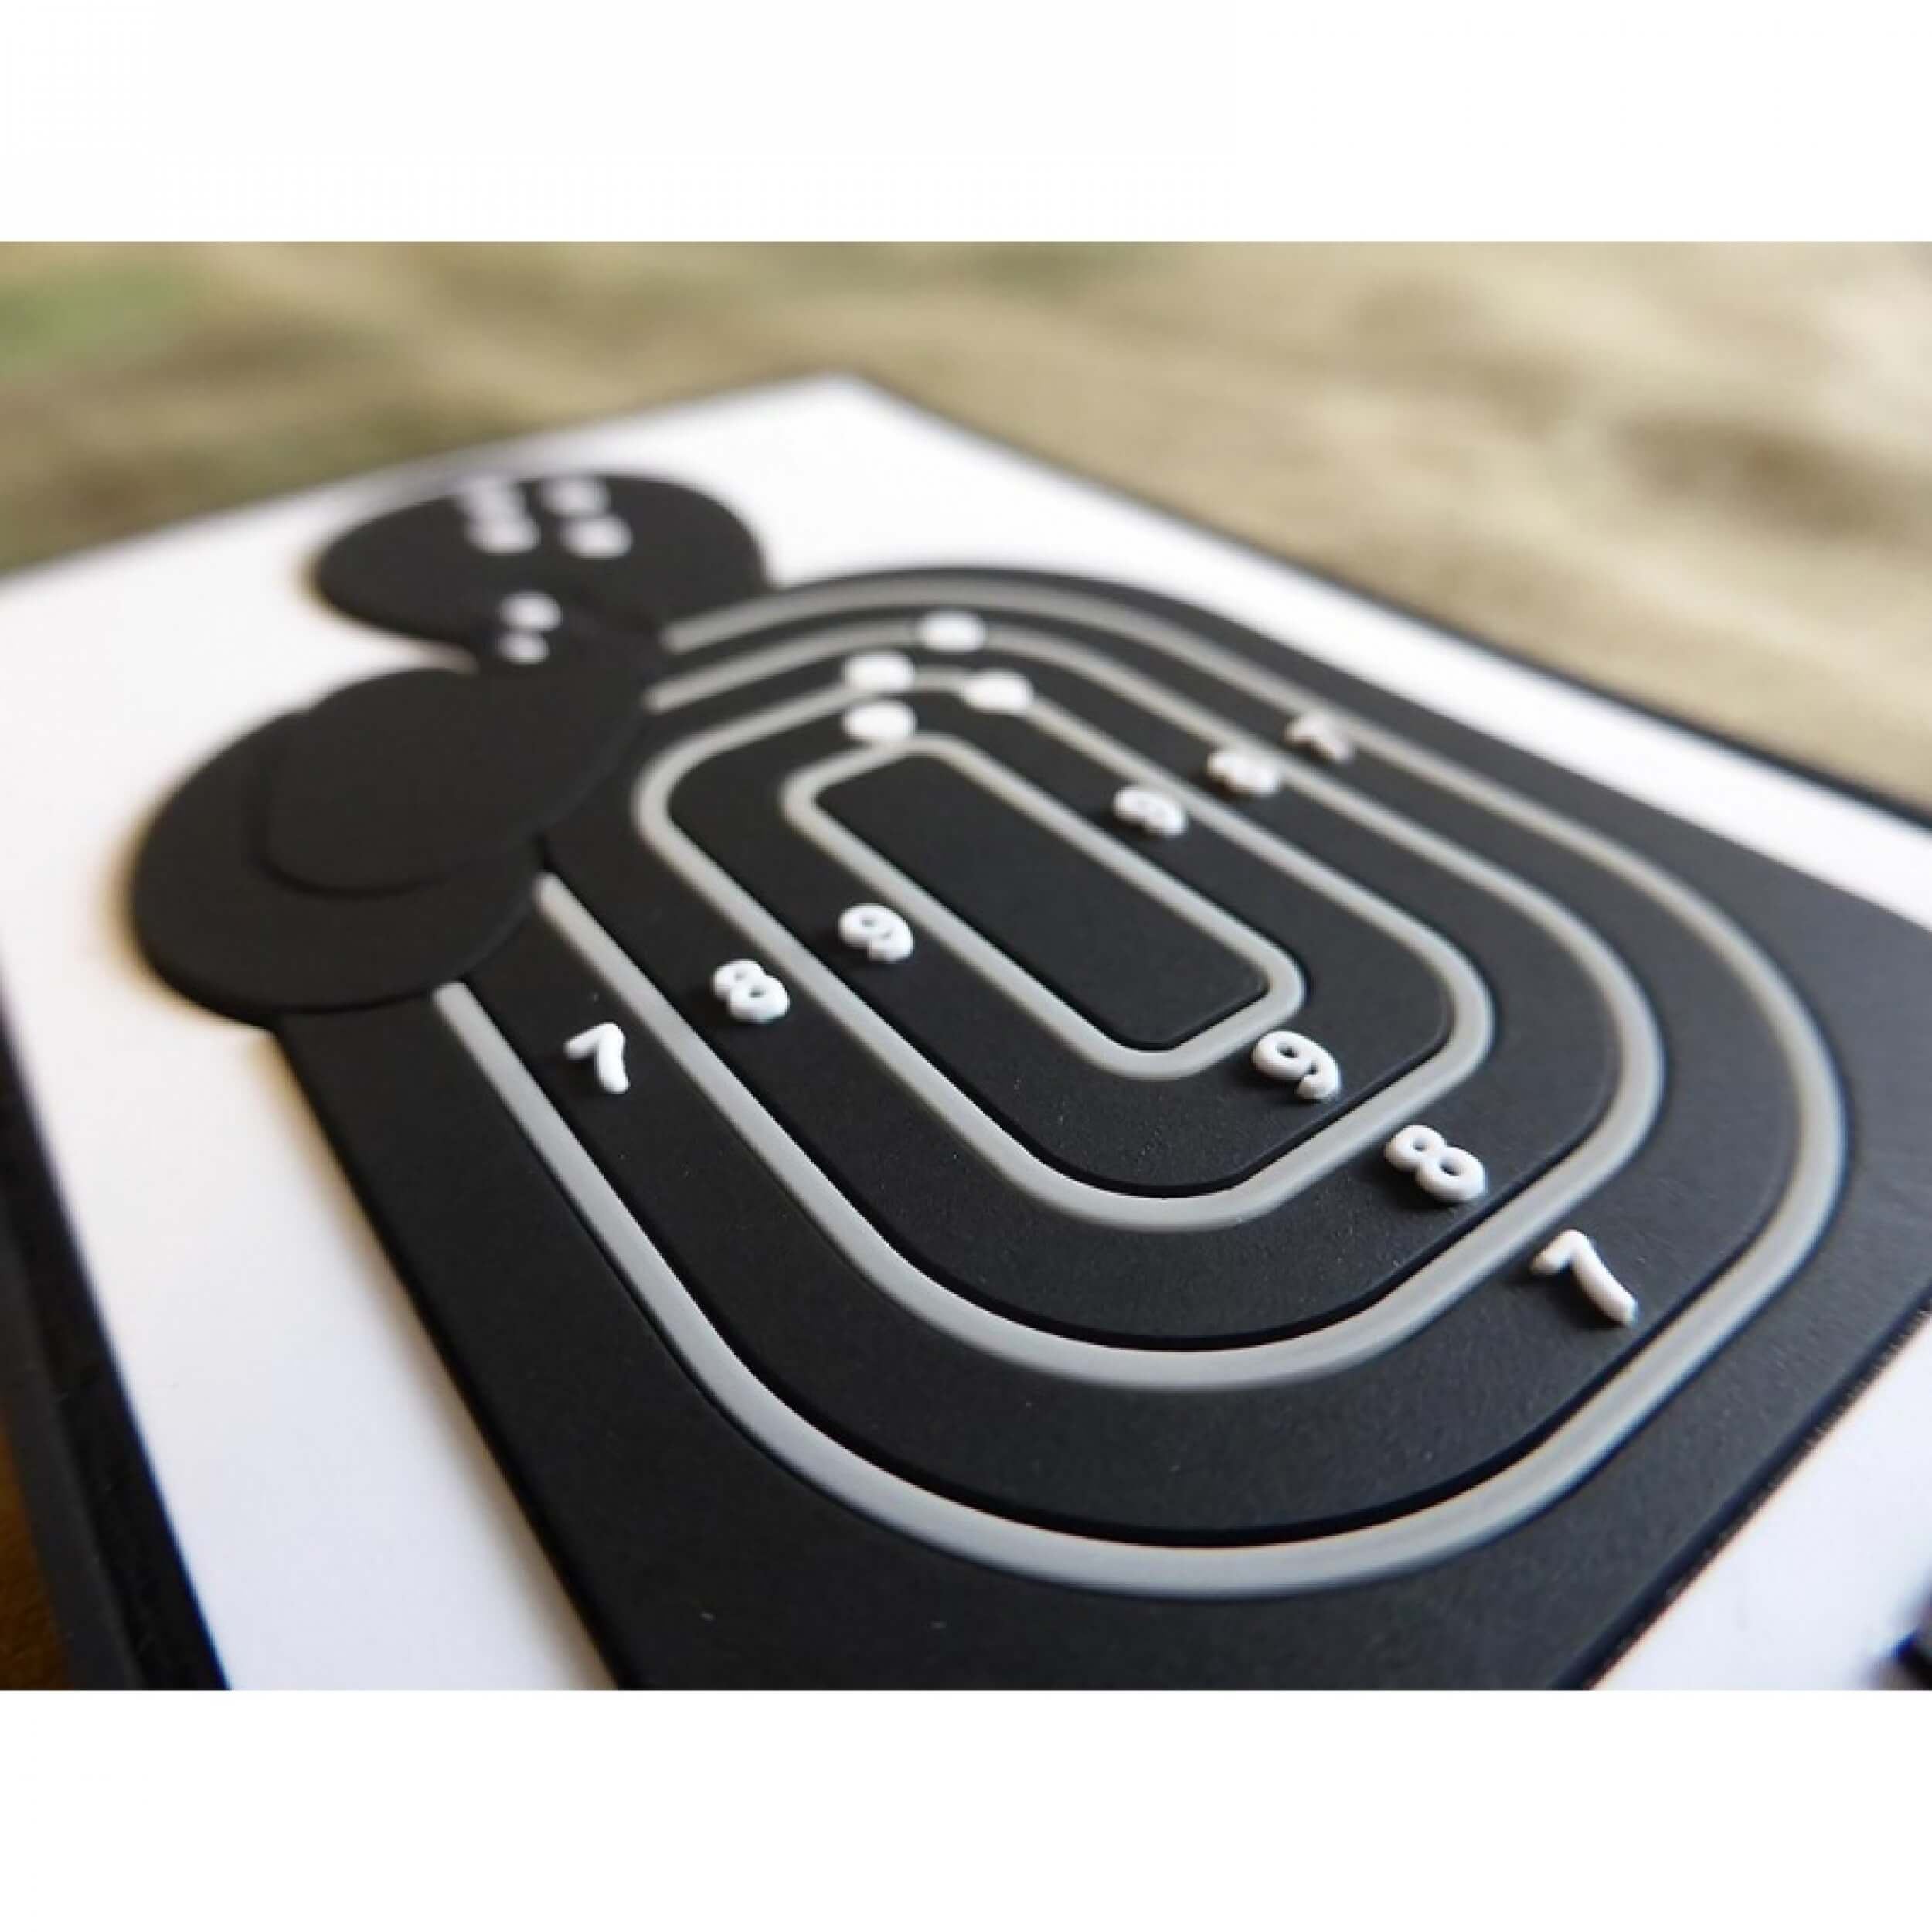 JTG Business Card Patch, fullcolor / JTG 3D Rubber Patch